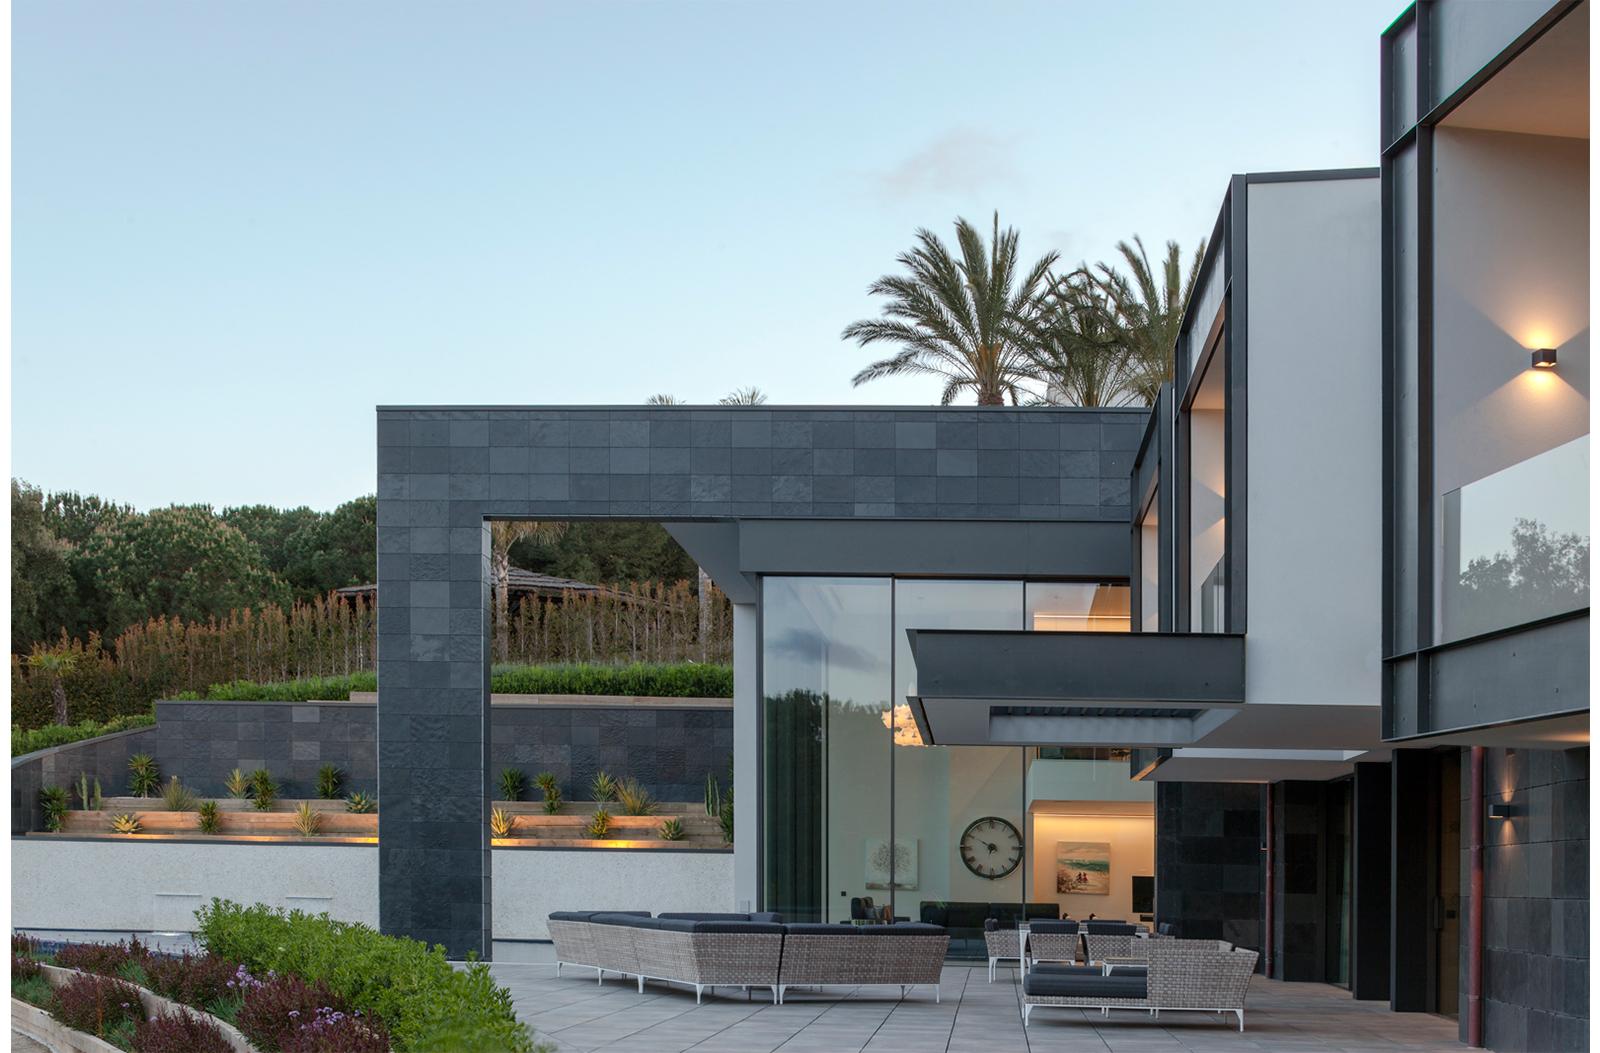 Villa-Kearney-Residential-Villa-Project-Architect-Spain-12